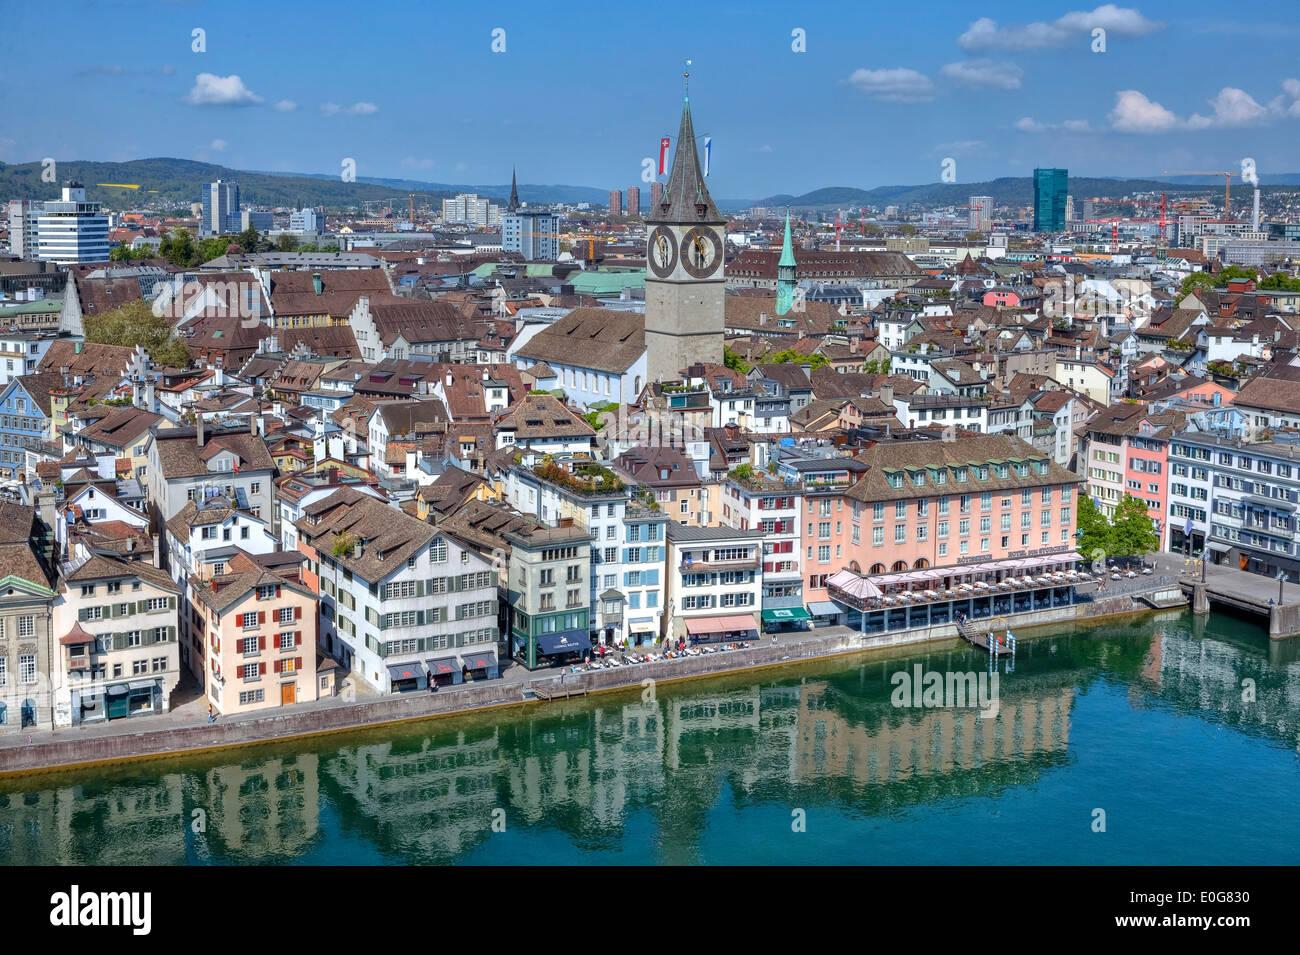 Zurigo, San Pietro, chiesa, Wuehre, Limmat, Svizzera Immagini Stock